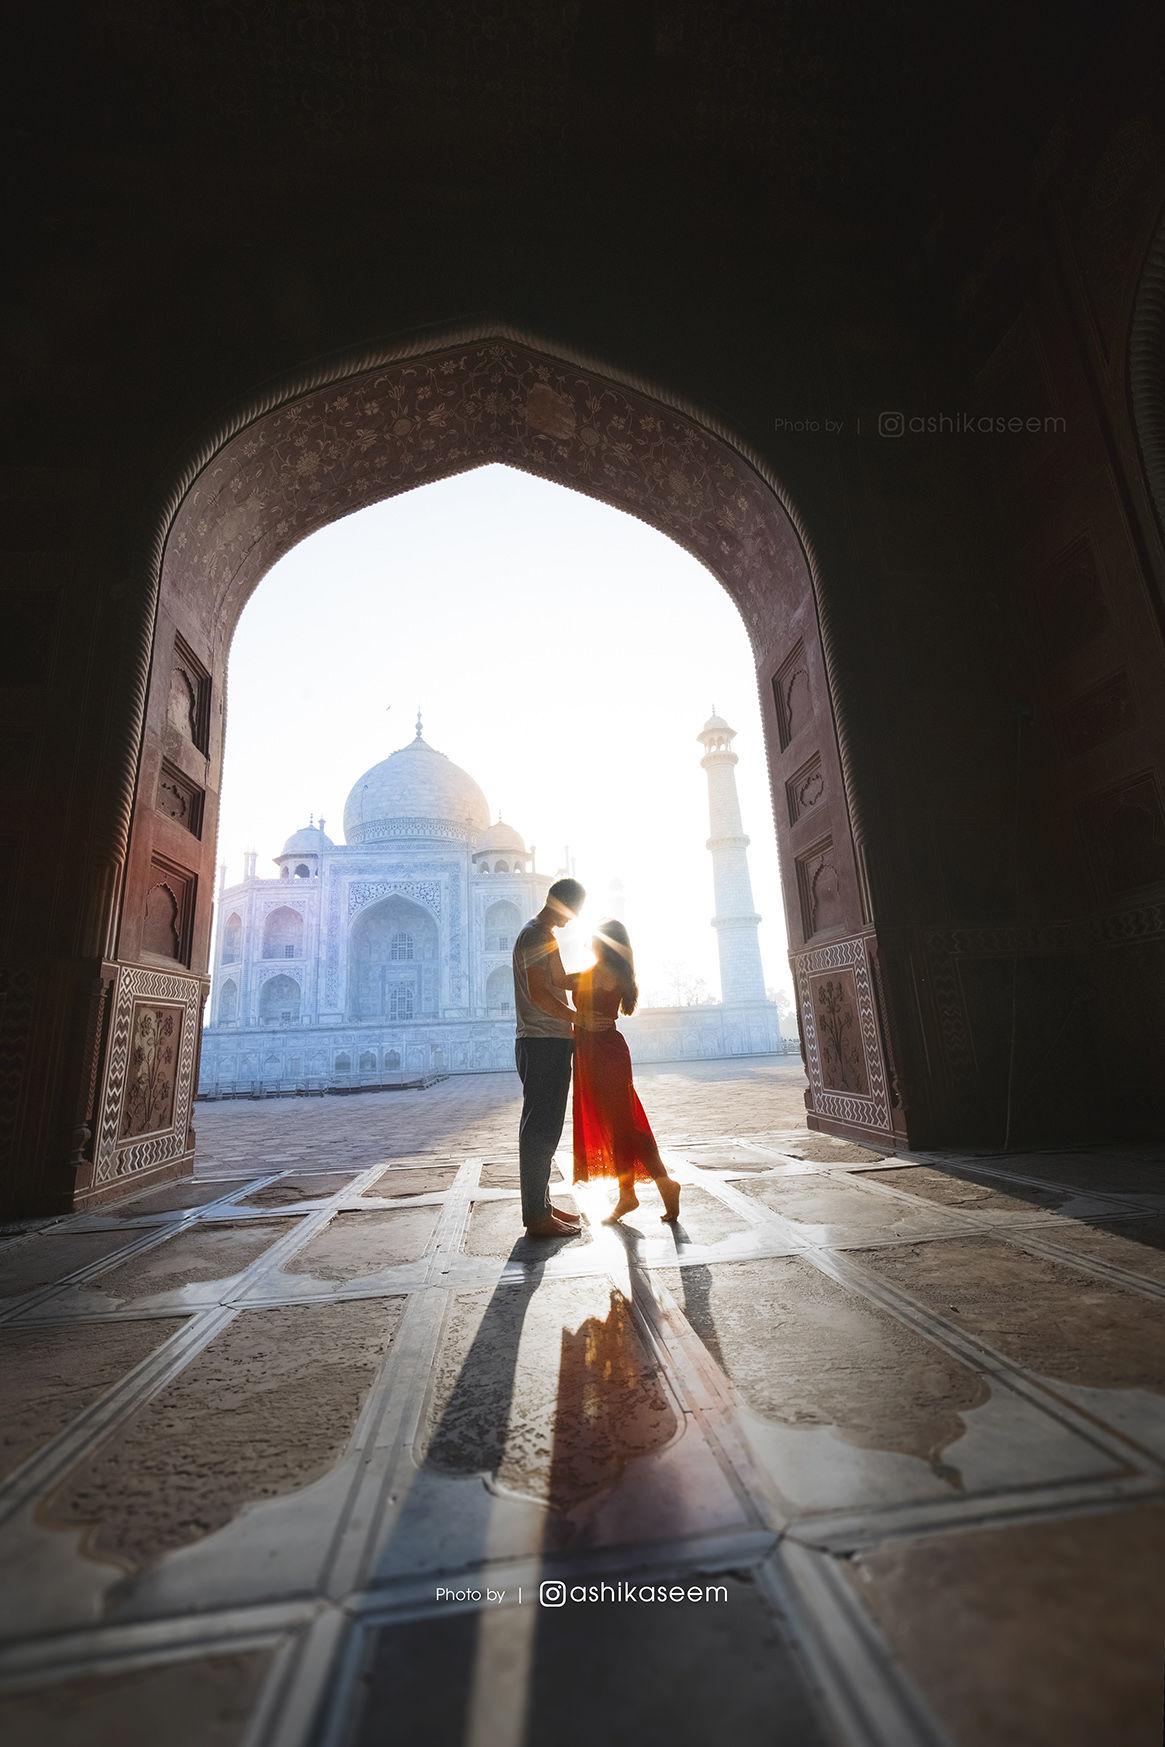 Photo of Taj Mahal By Ashik Aseem